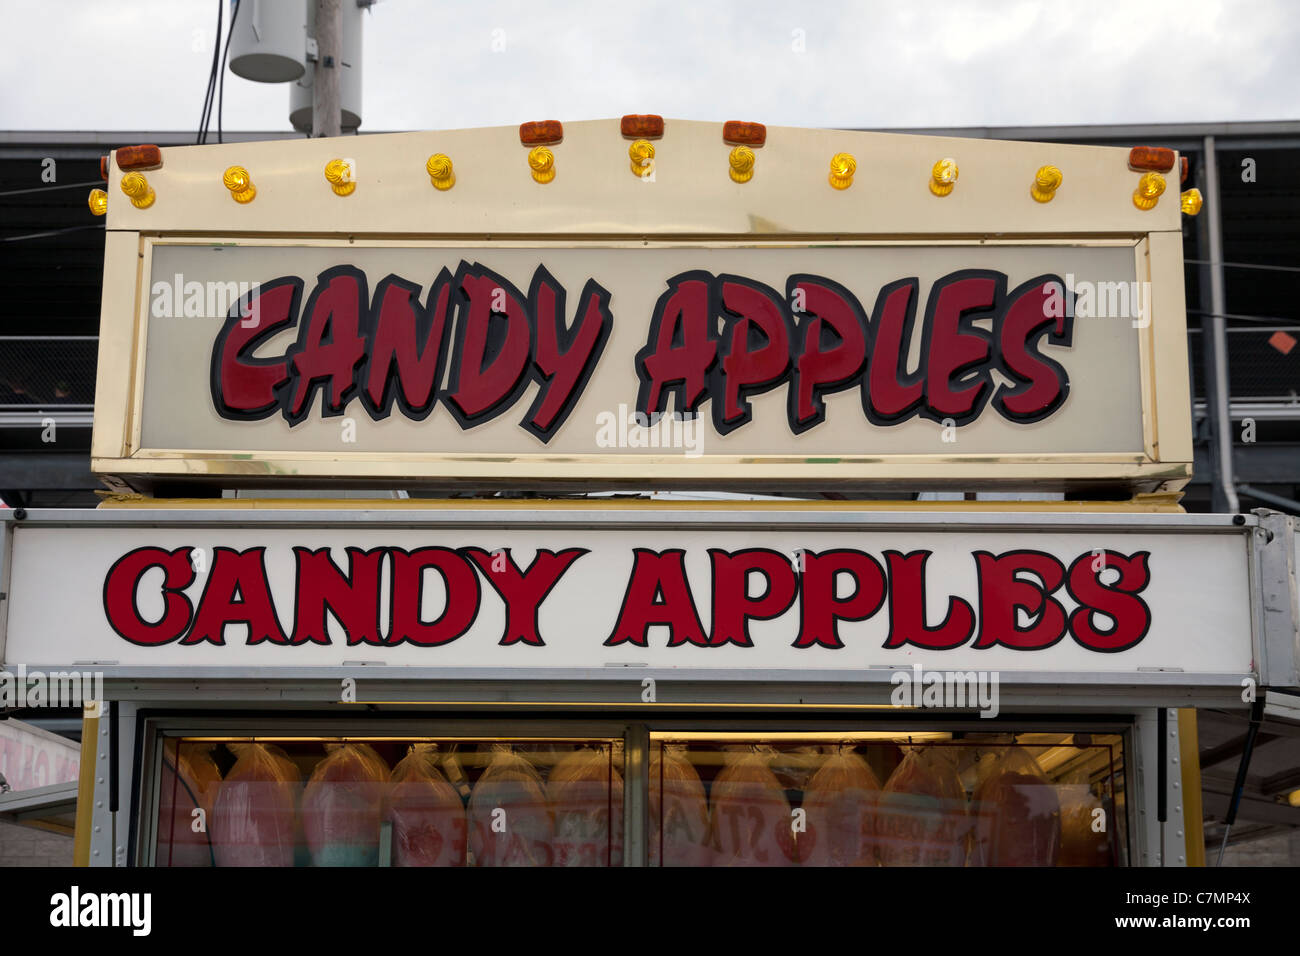 Candy Apple Vendor at county food fair Michigan USA Stock Photo